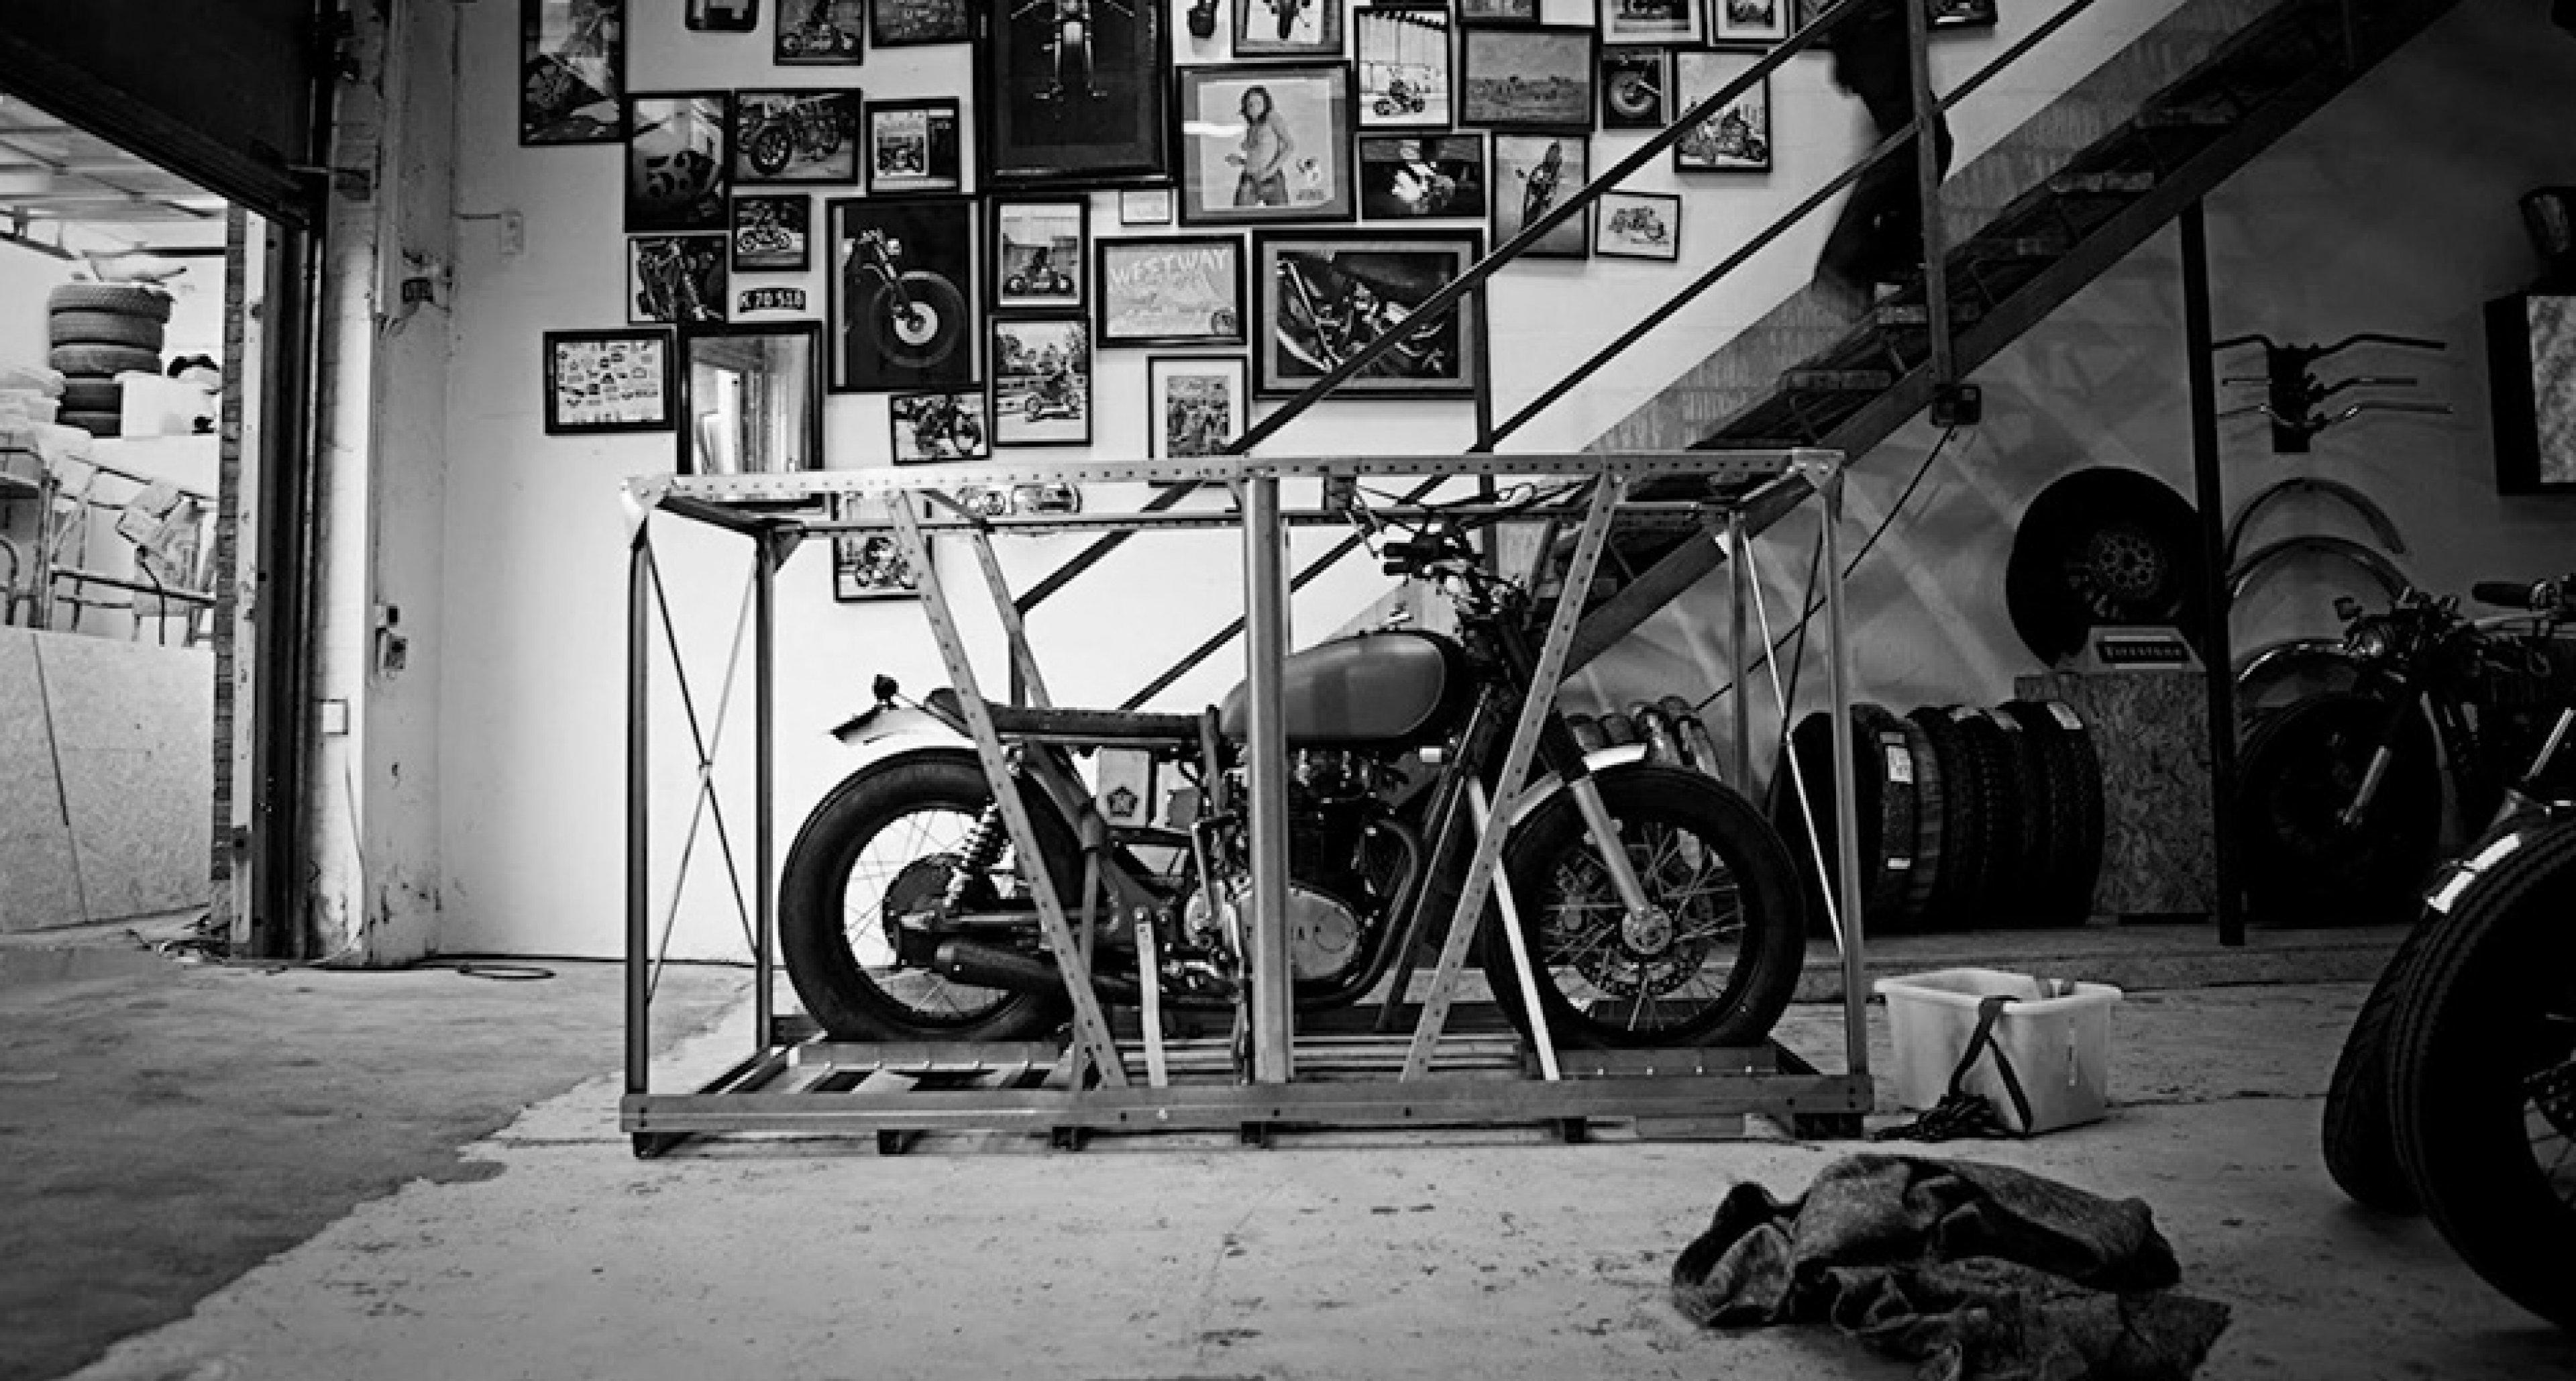 Wrenchmonkees is one of the increasingly popular custom bike builders